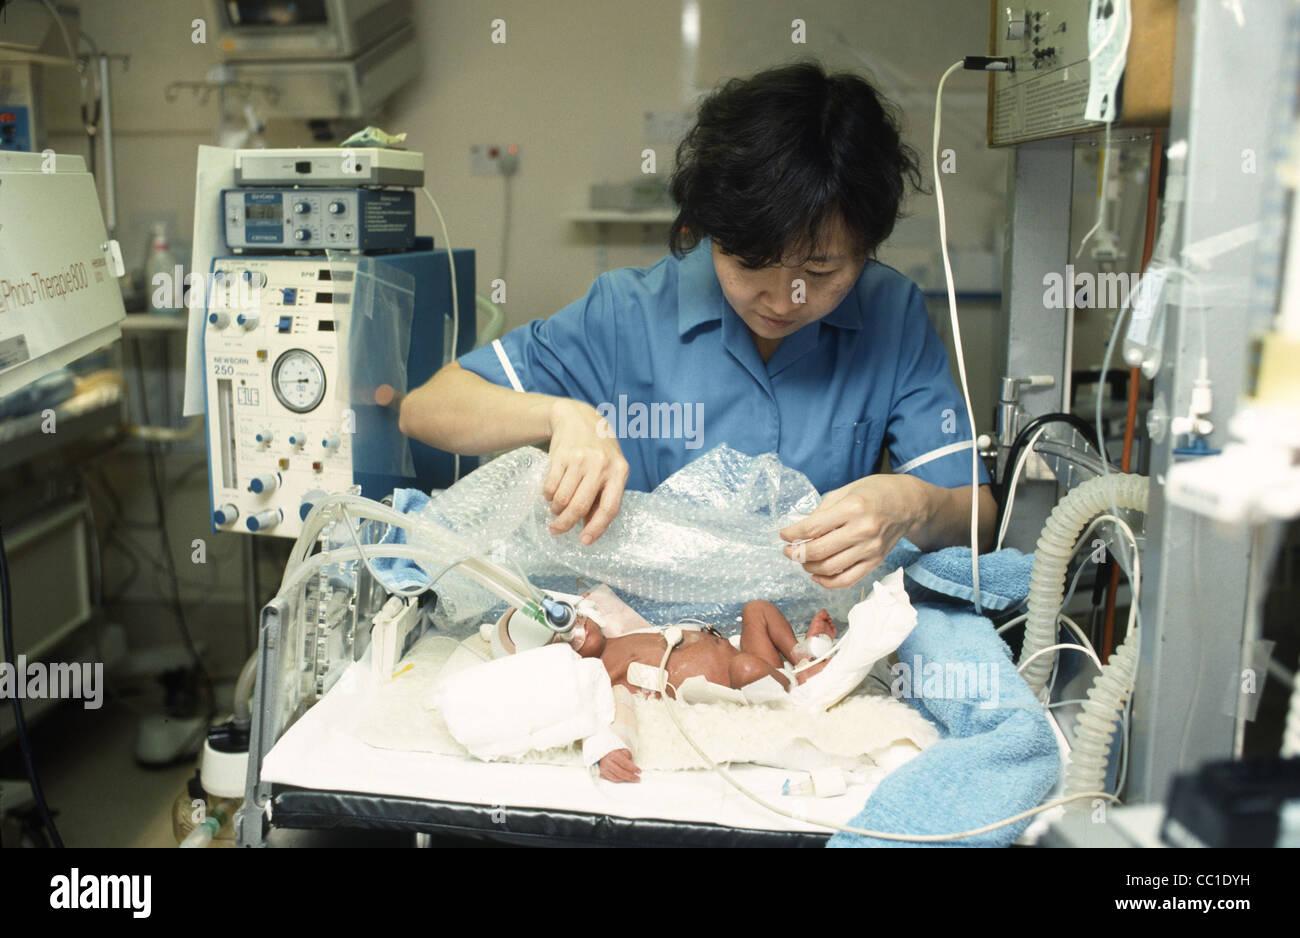 Nurse Tending Baby In Neonatal Intensive Care Unit Stock Photo